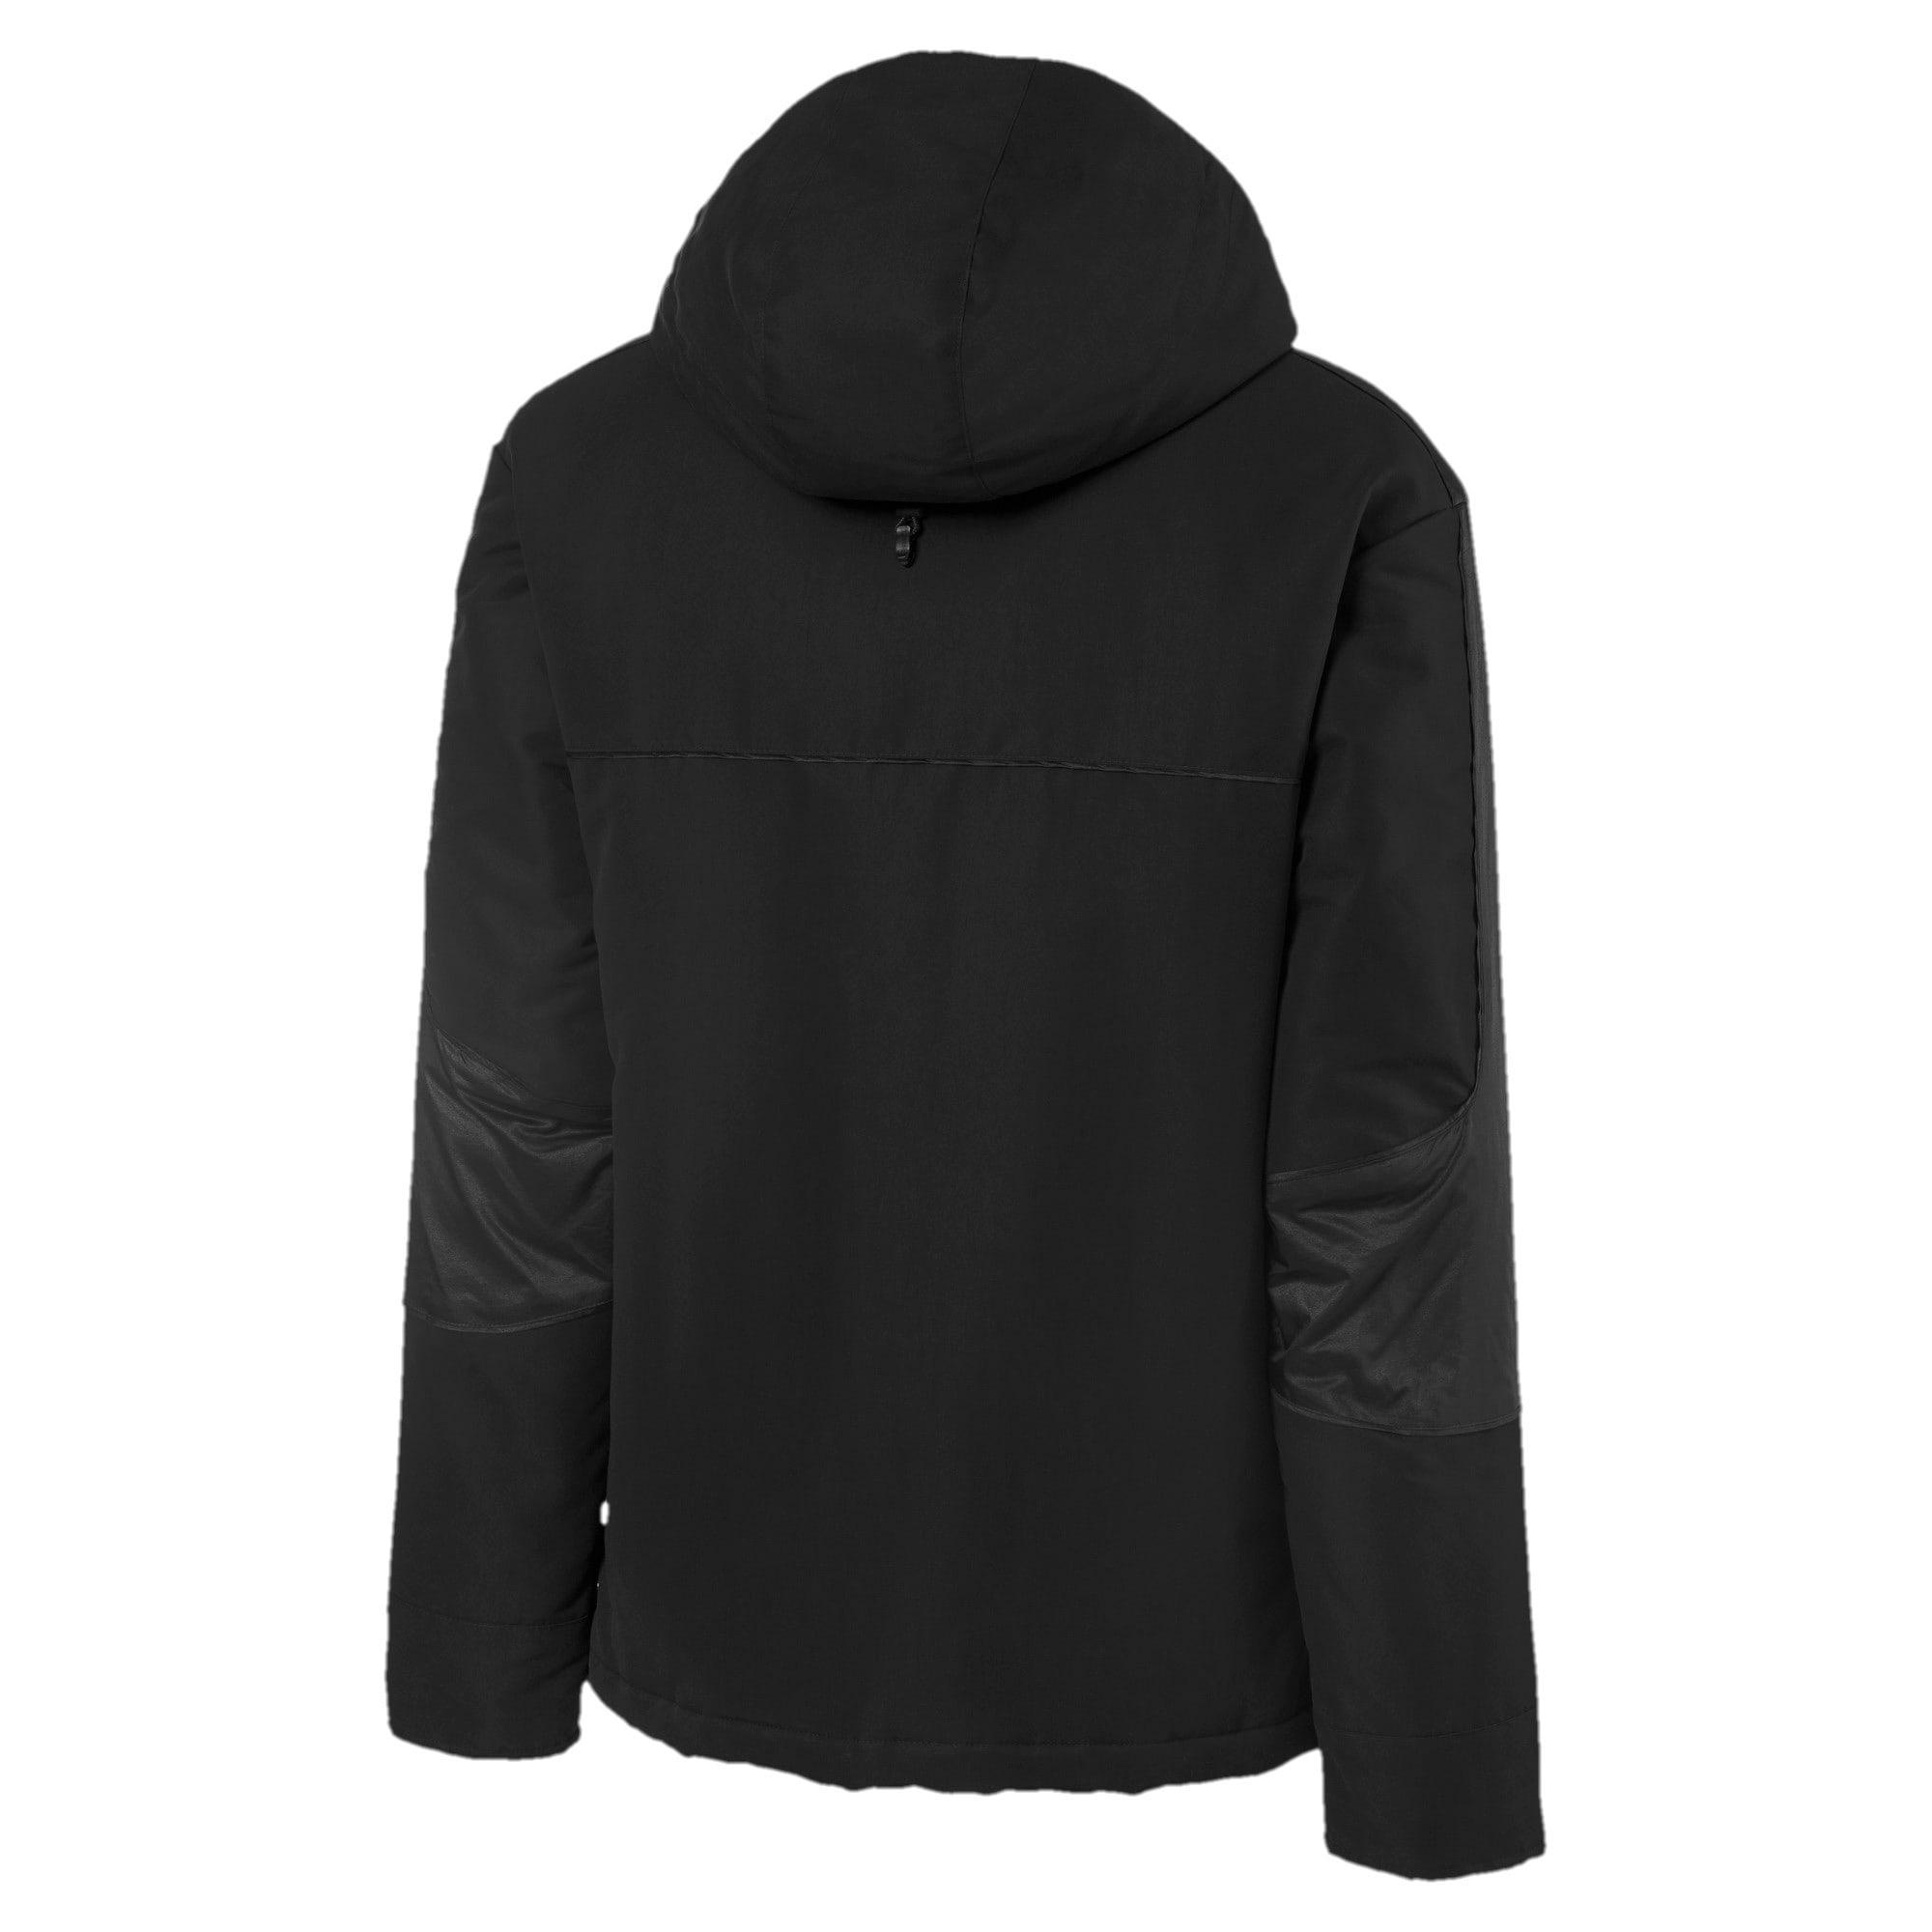 Thumbnail 2 of Mercedes RCT Men's Jacket, Puma Black, medium